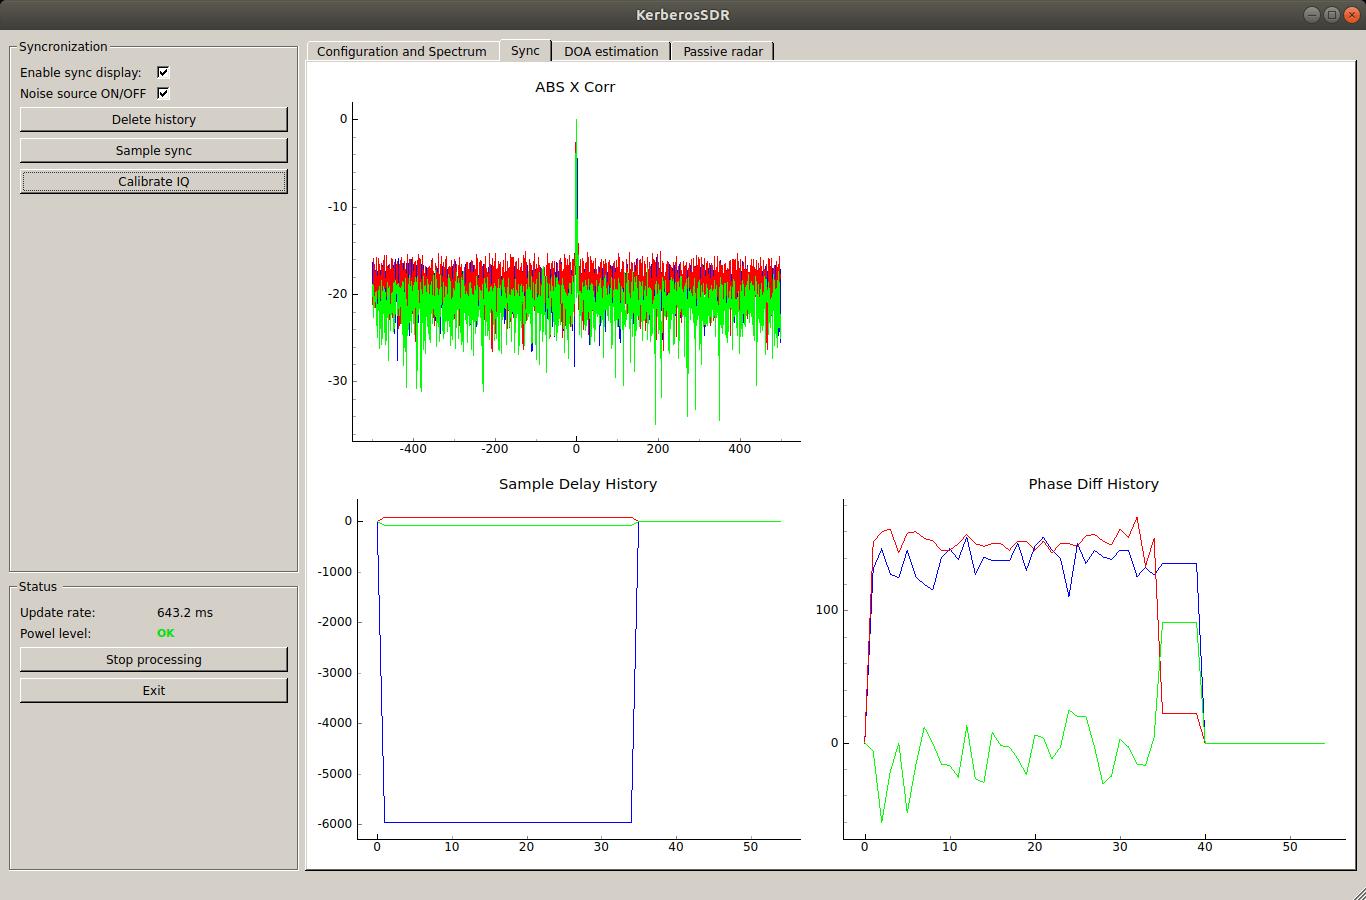 Kerberos SDR Synchronized